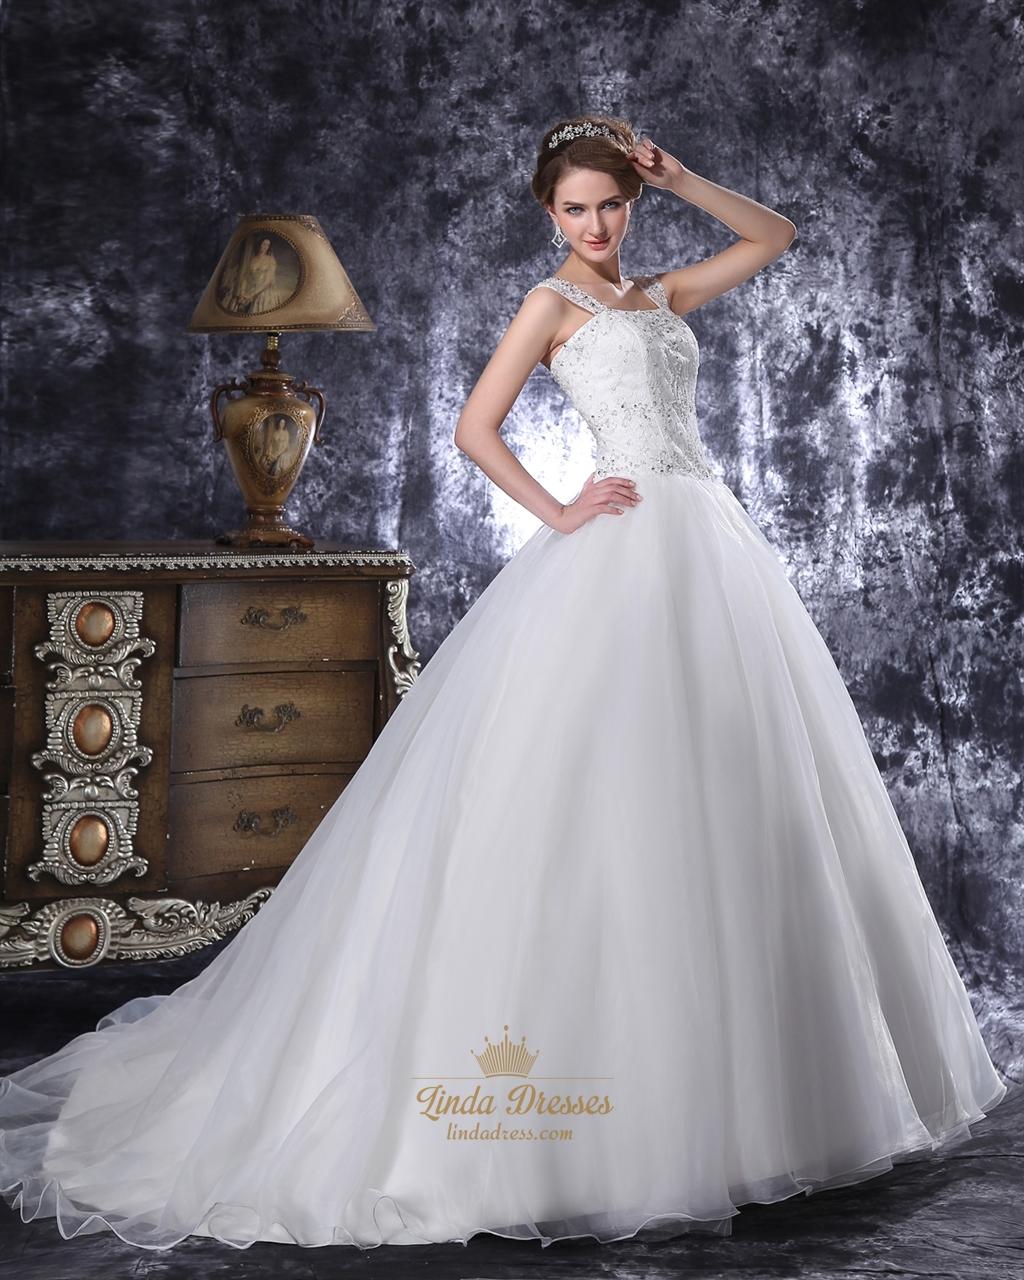 Drop Waist Ivory 2011 Wedding Dress With Jeweled Bodice: Ivory Lace Bodice Drop Waist Organza Wedding Dress With